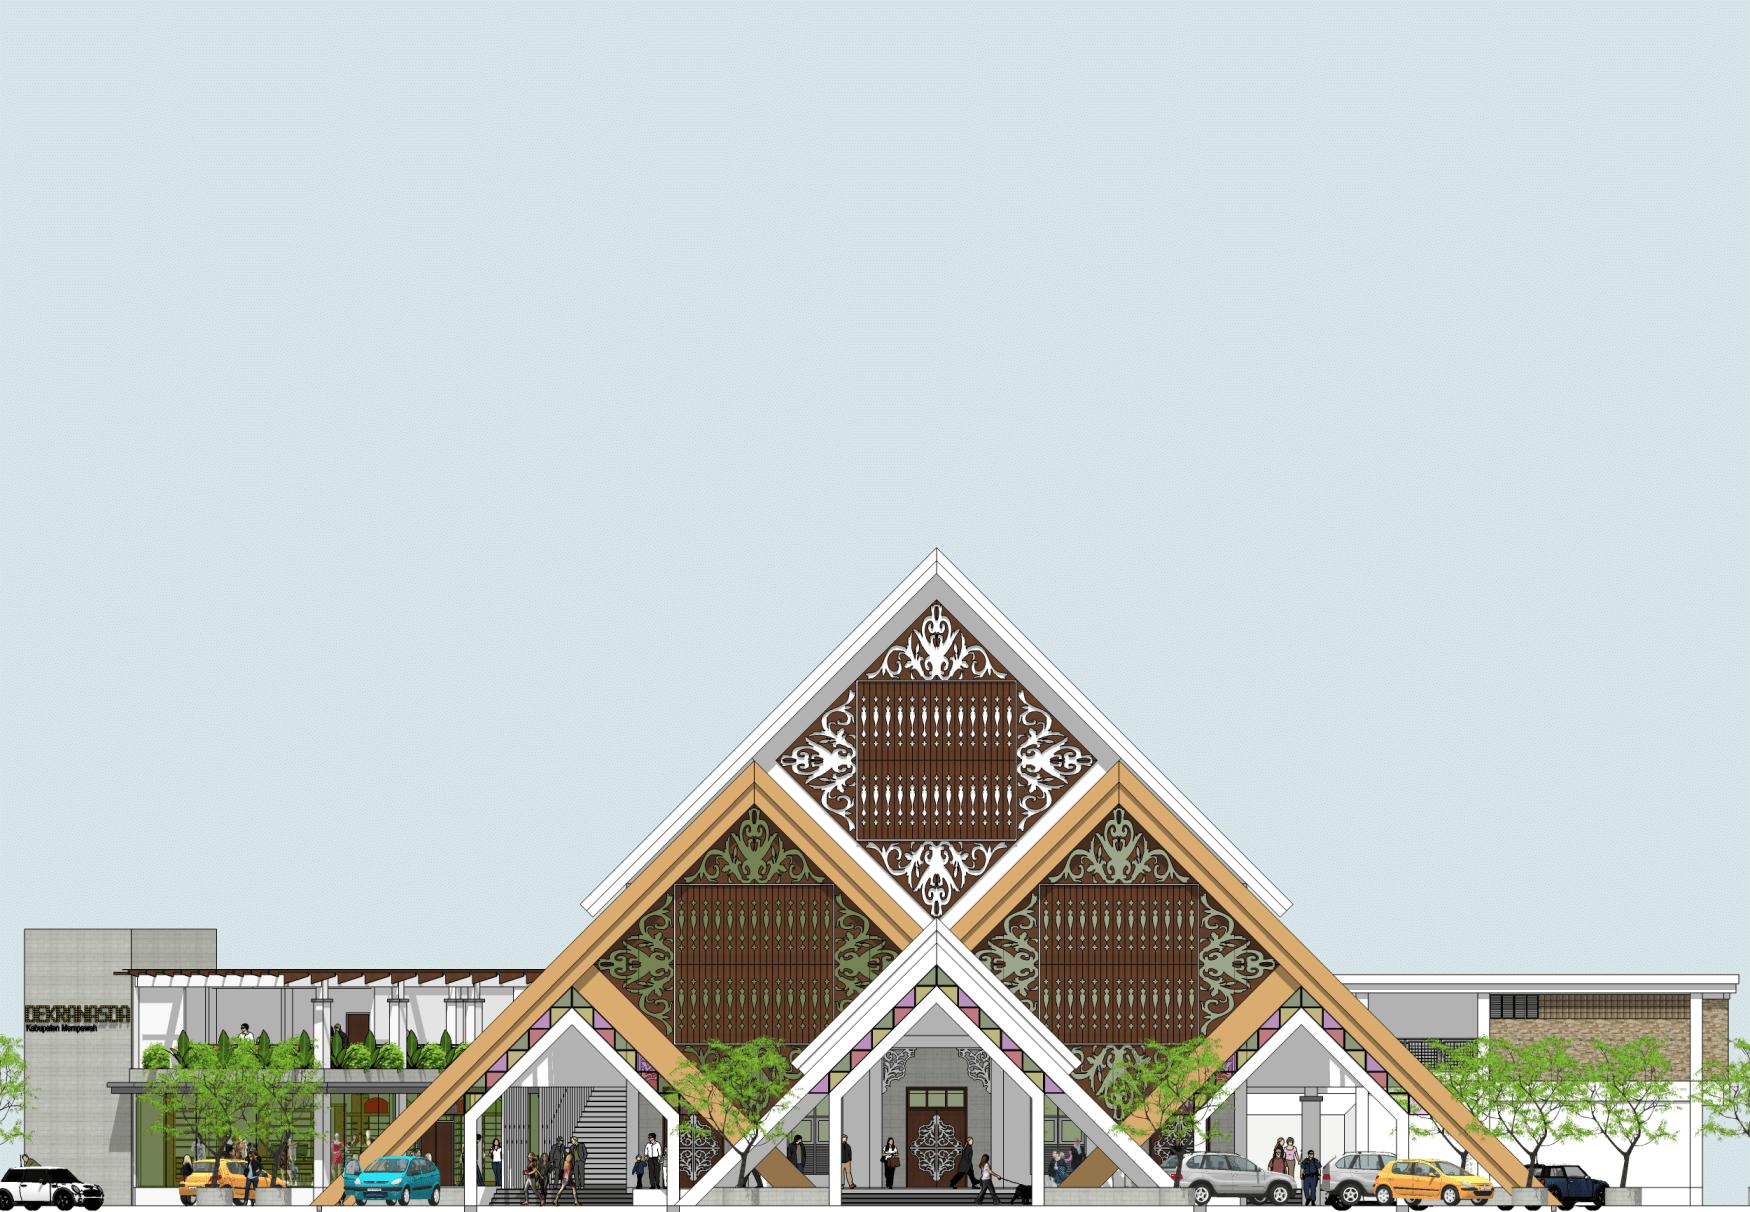 Rickyandpartners Architect Studio Mempawah Assembly House  Pontianak, West Kalimantan, Indonesia Pontianak, West Kalimantan, Indonesia Facade Modern  3458